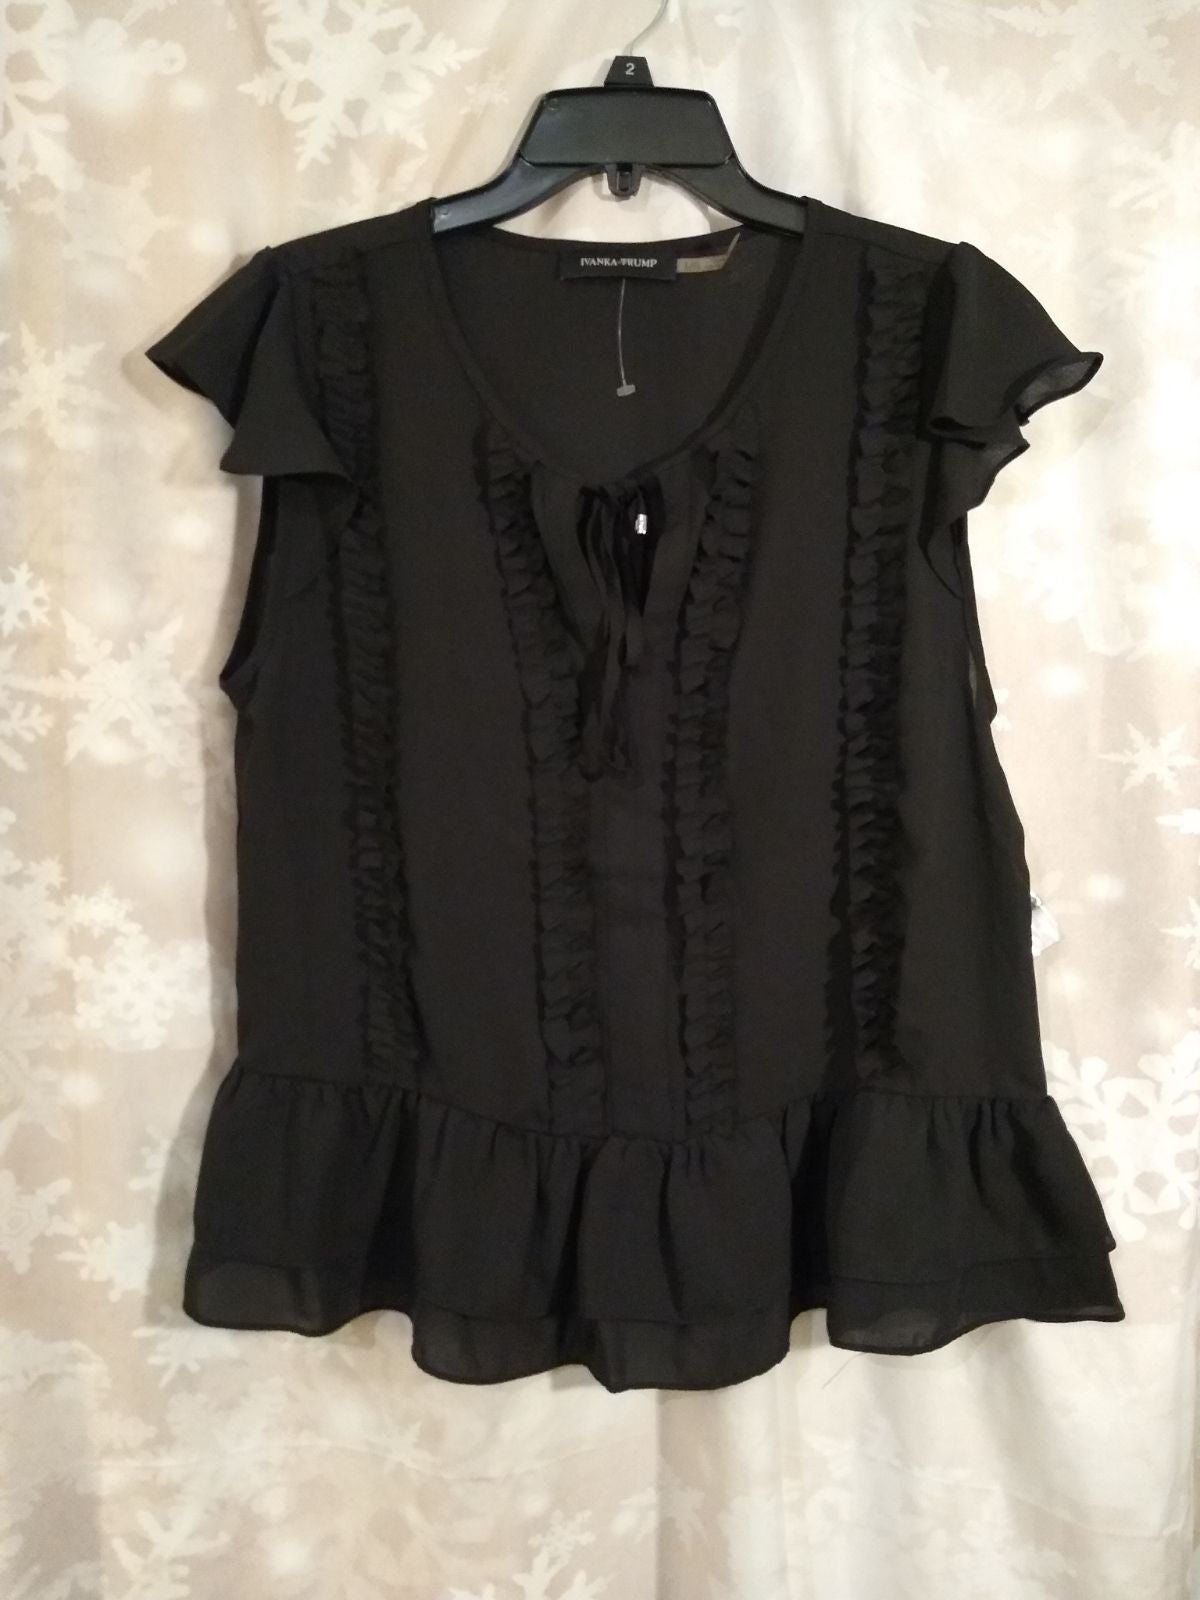 Black ruffled top